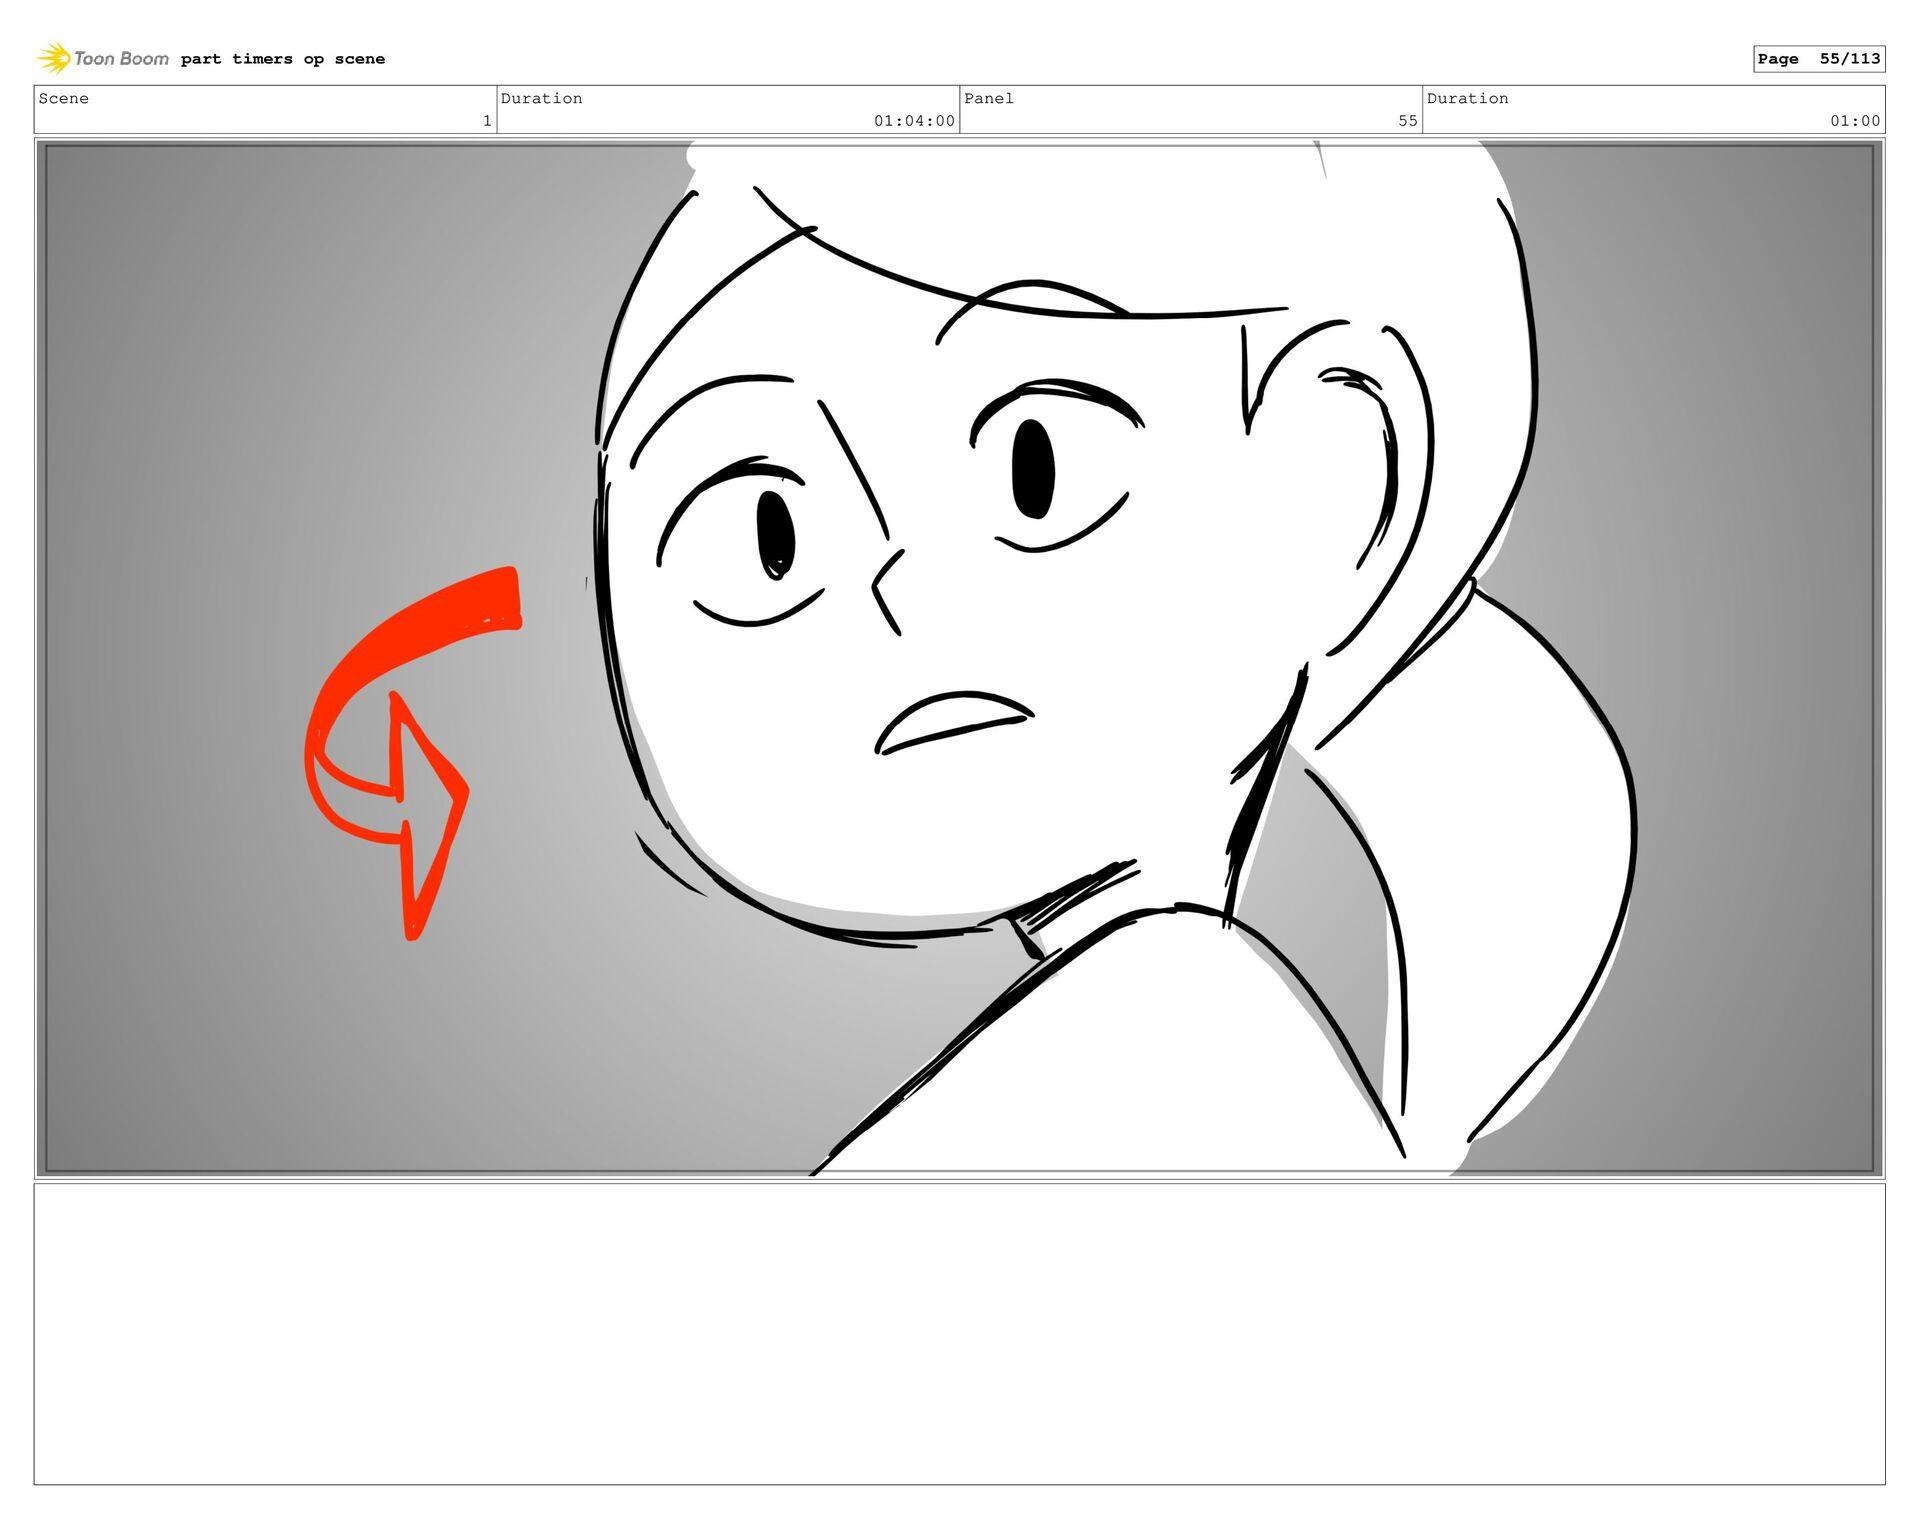 Scene 3 Duration 44:00 Panel 23 Duration 01:00 ...